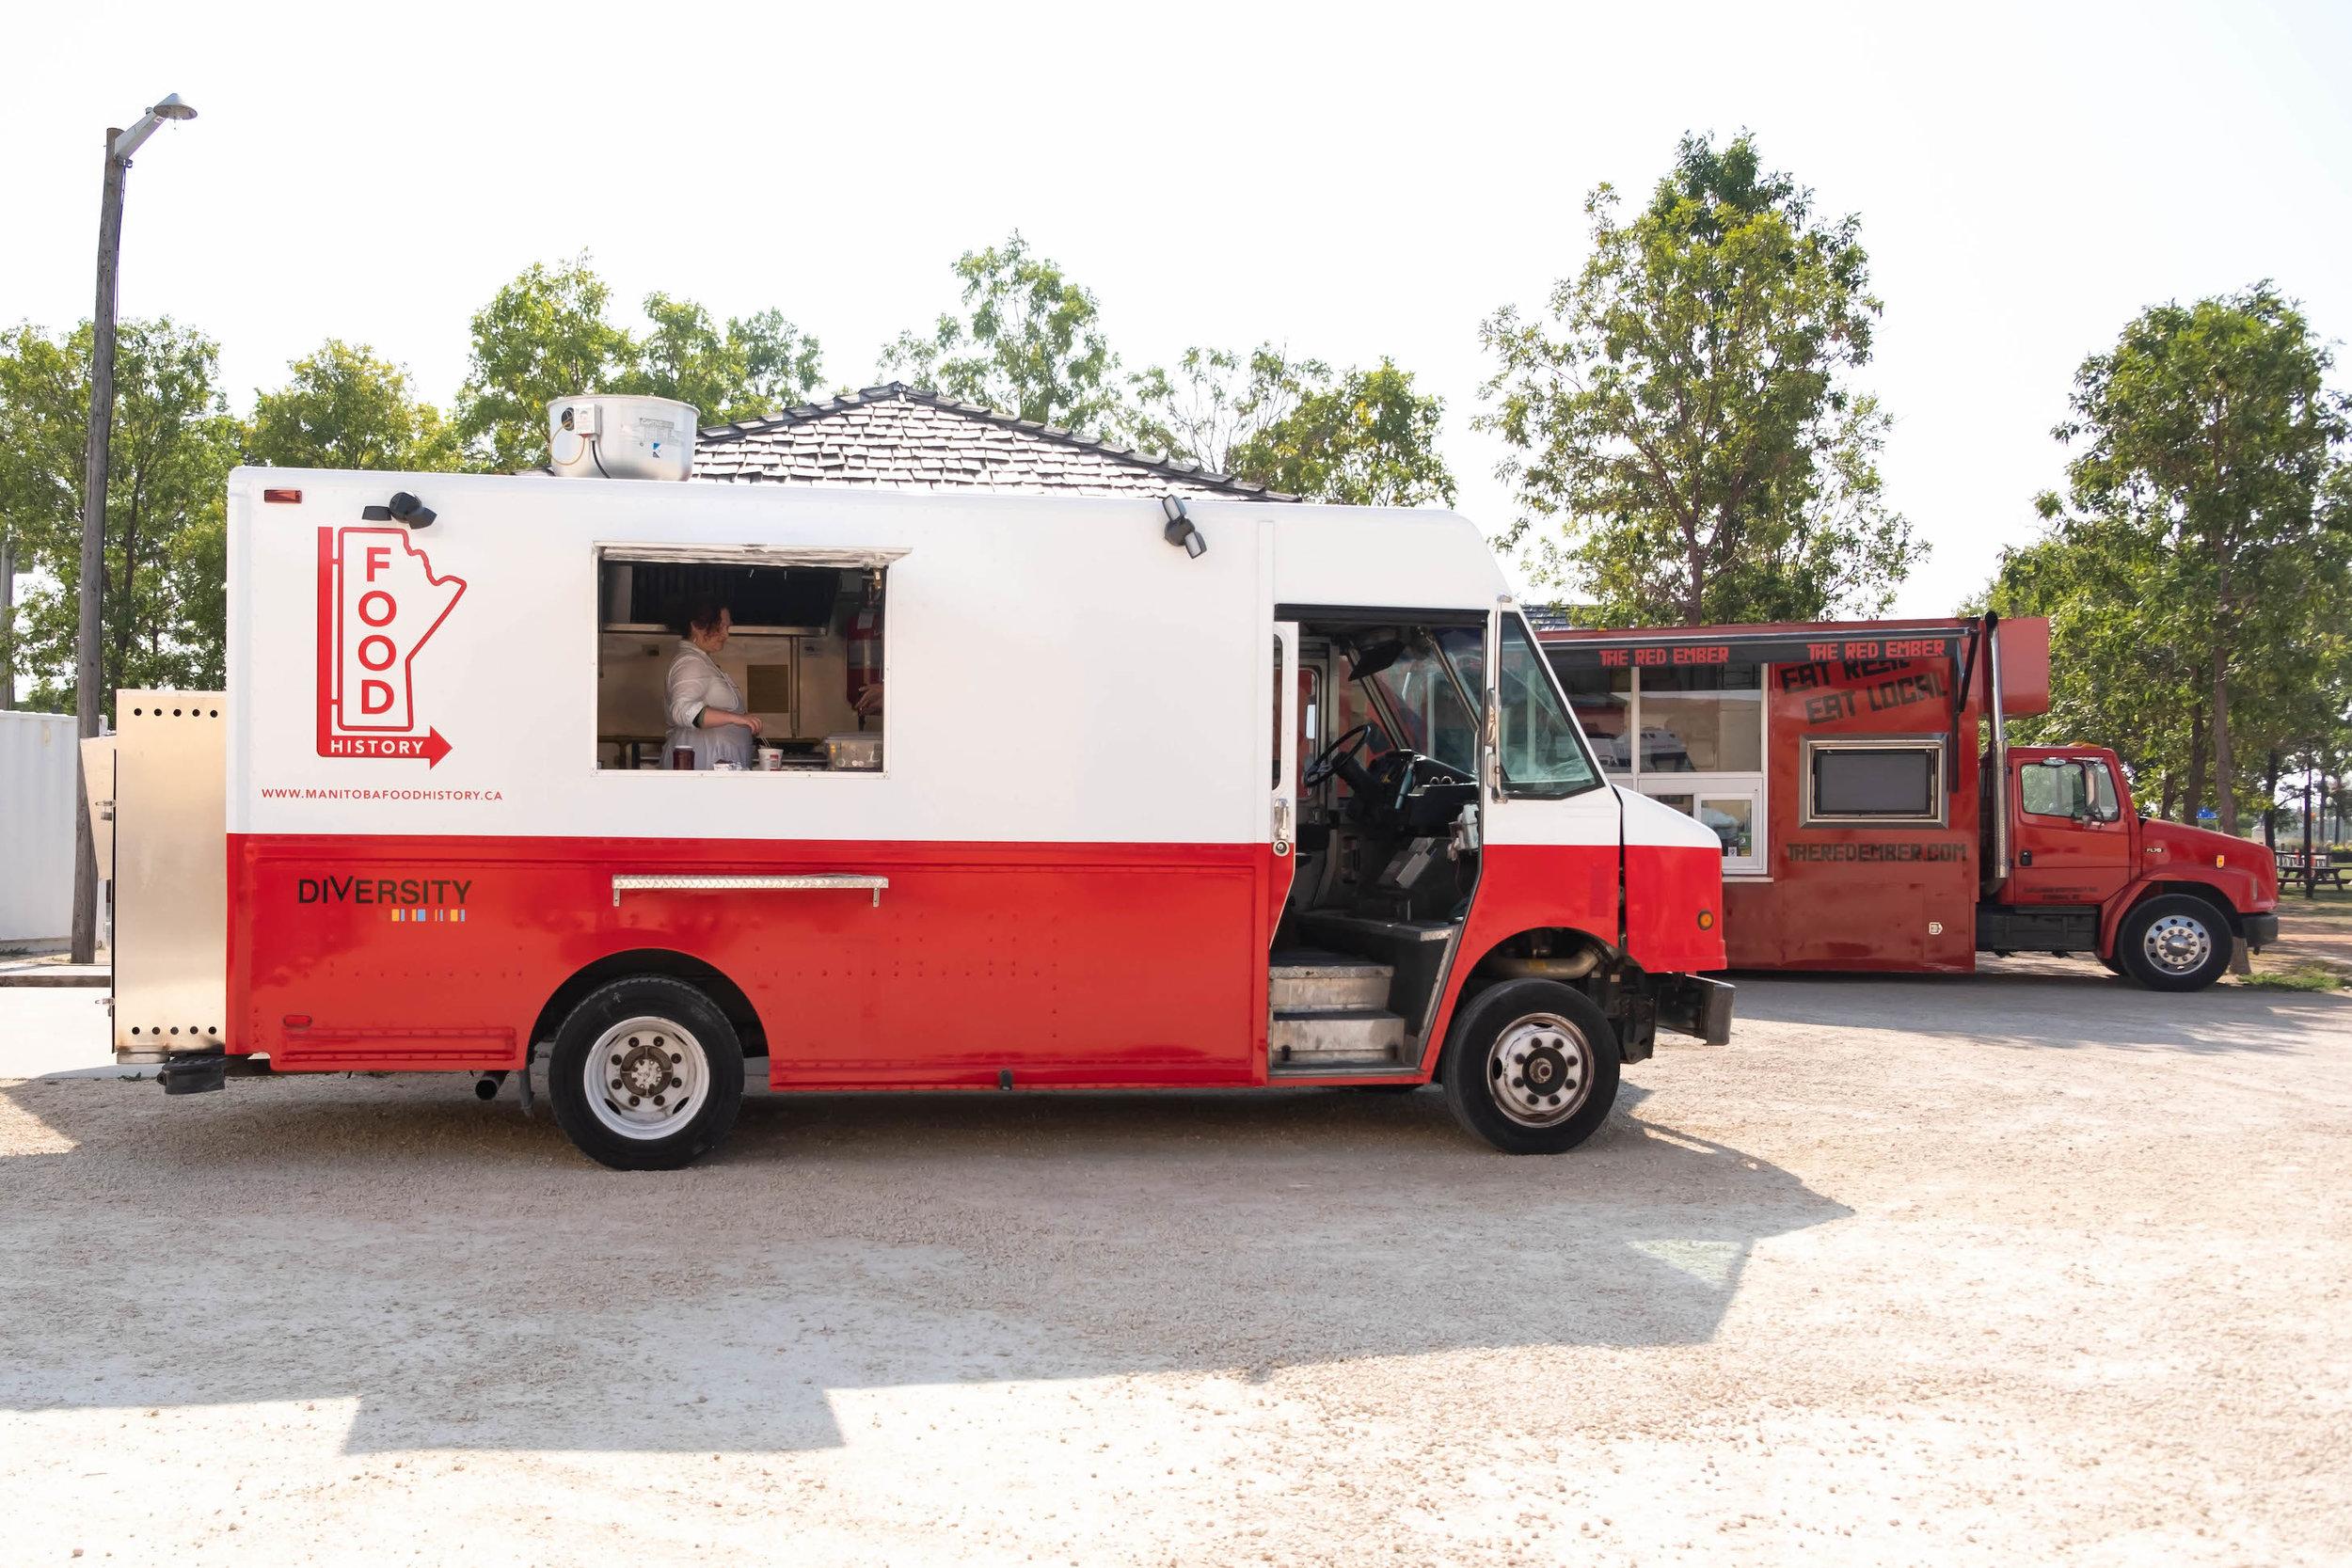 The Manitoba Food History Truck at St. Norbert Farmer's Market. Photo by Kimberley Moore.